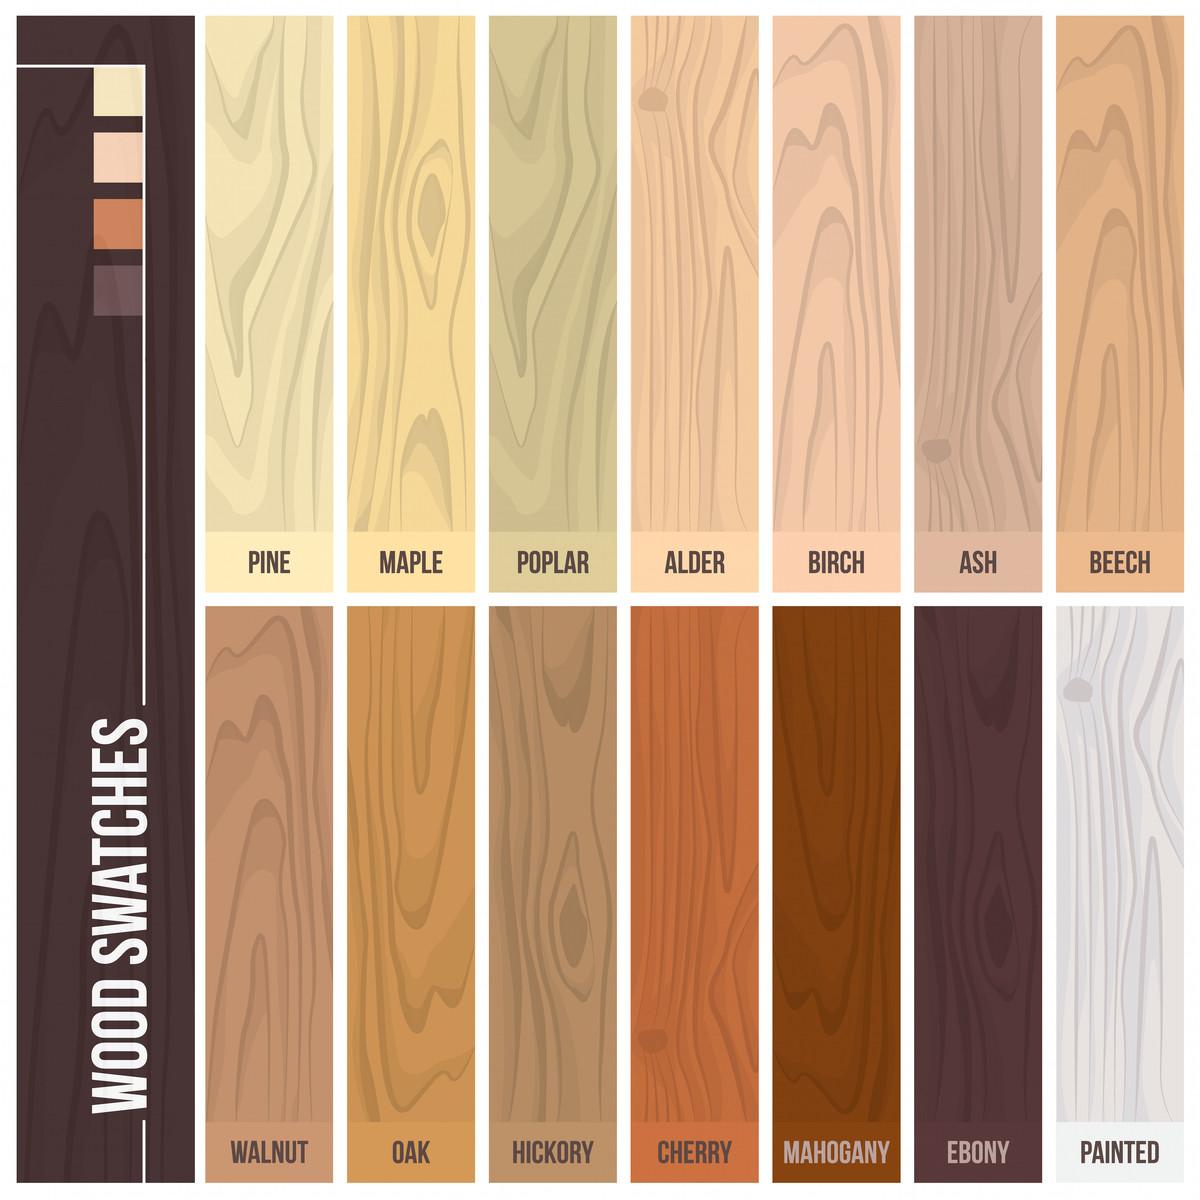 hardwood floor hardness ranking of 12 types of hardwood flooring species styles edging dimensions for types of hardwood flooring illustrated guide